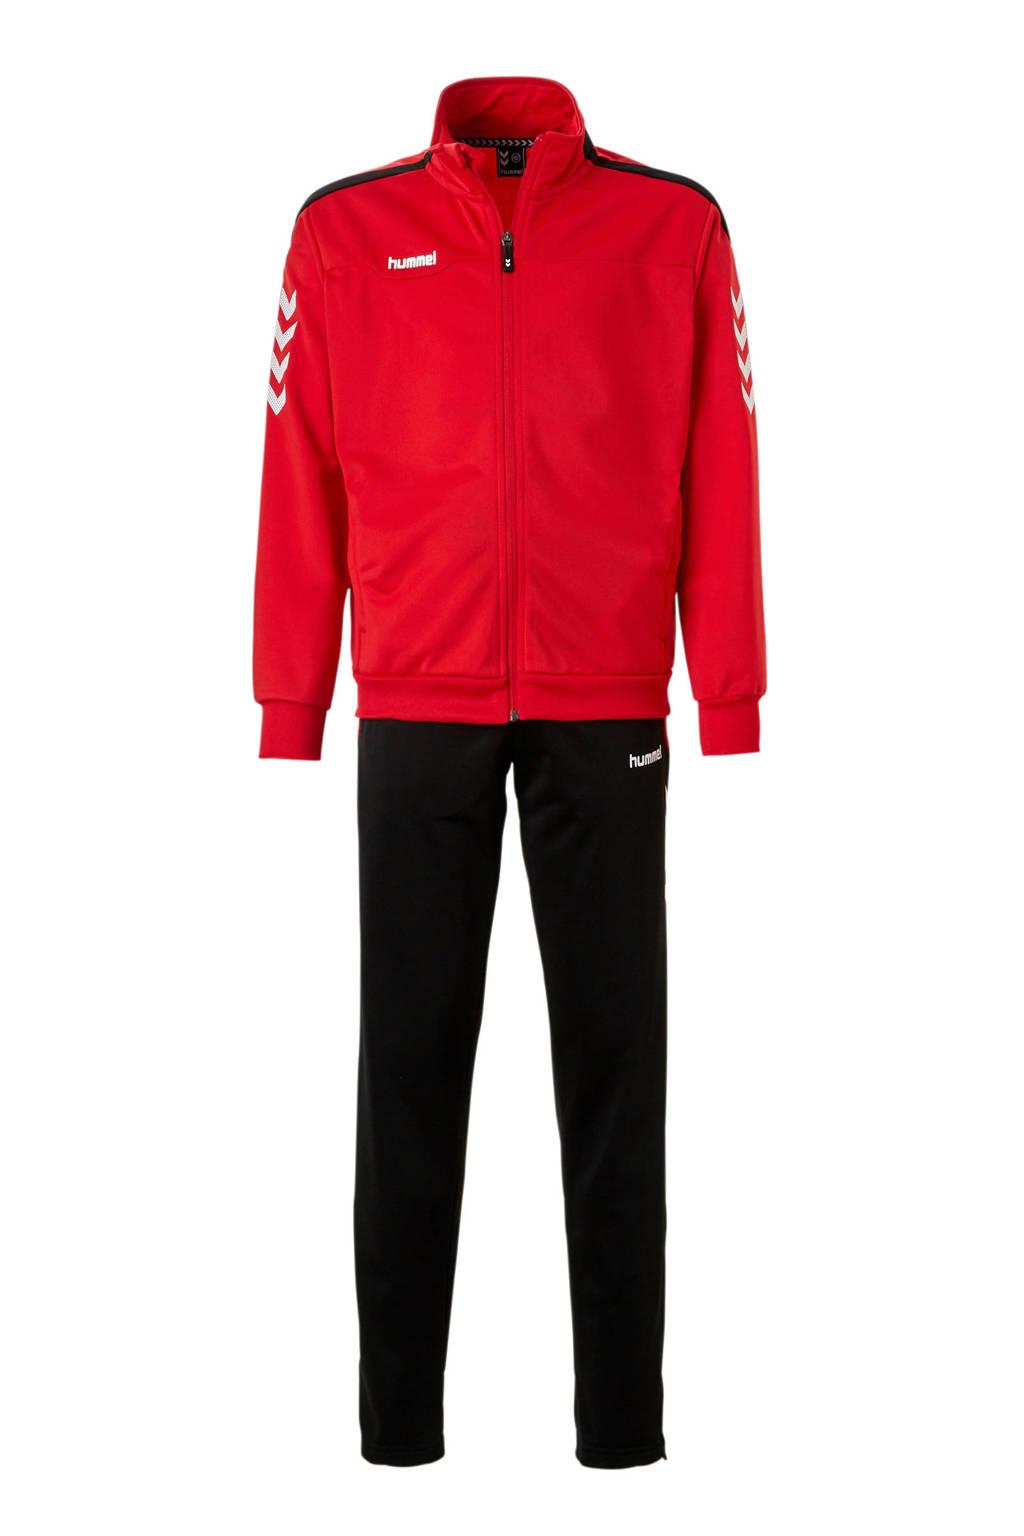 hummel Junior  Valencia trainingspak rood/zwart, Rood/zwart, Jongens/meisjes